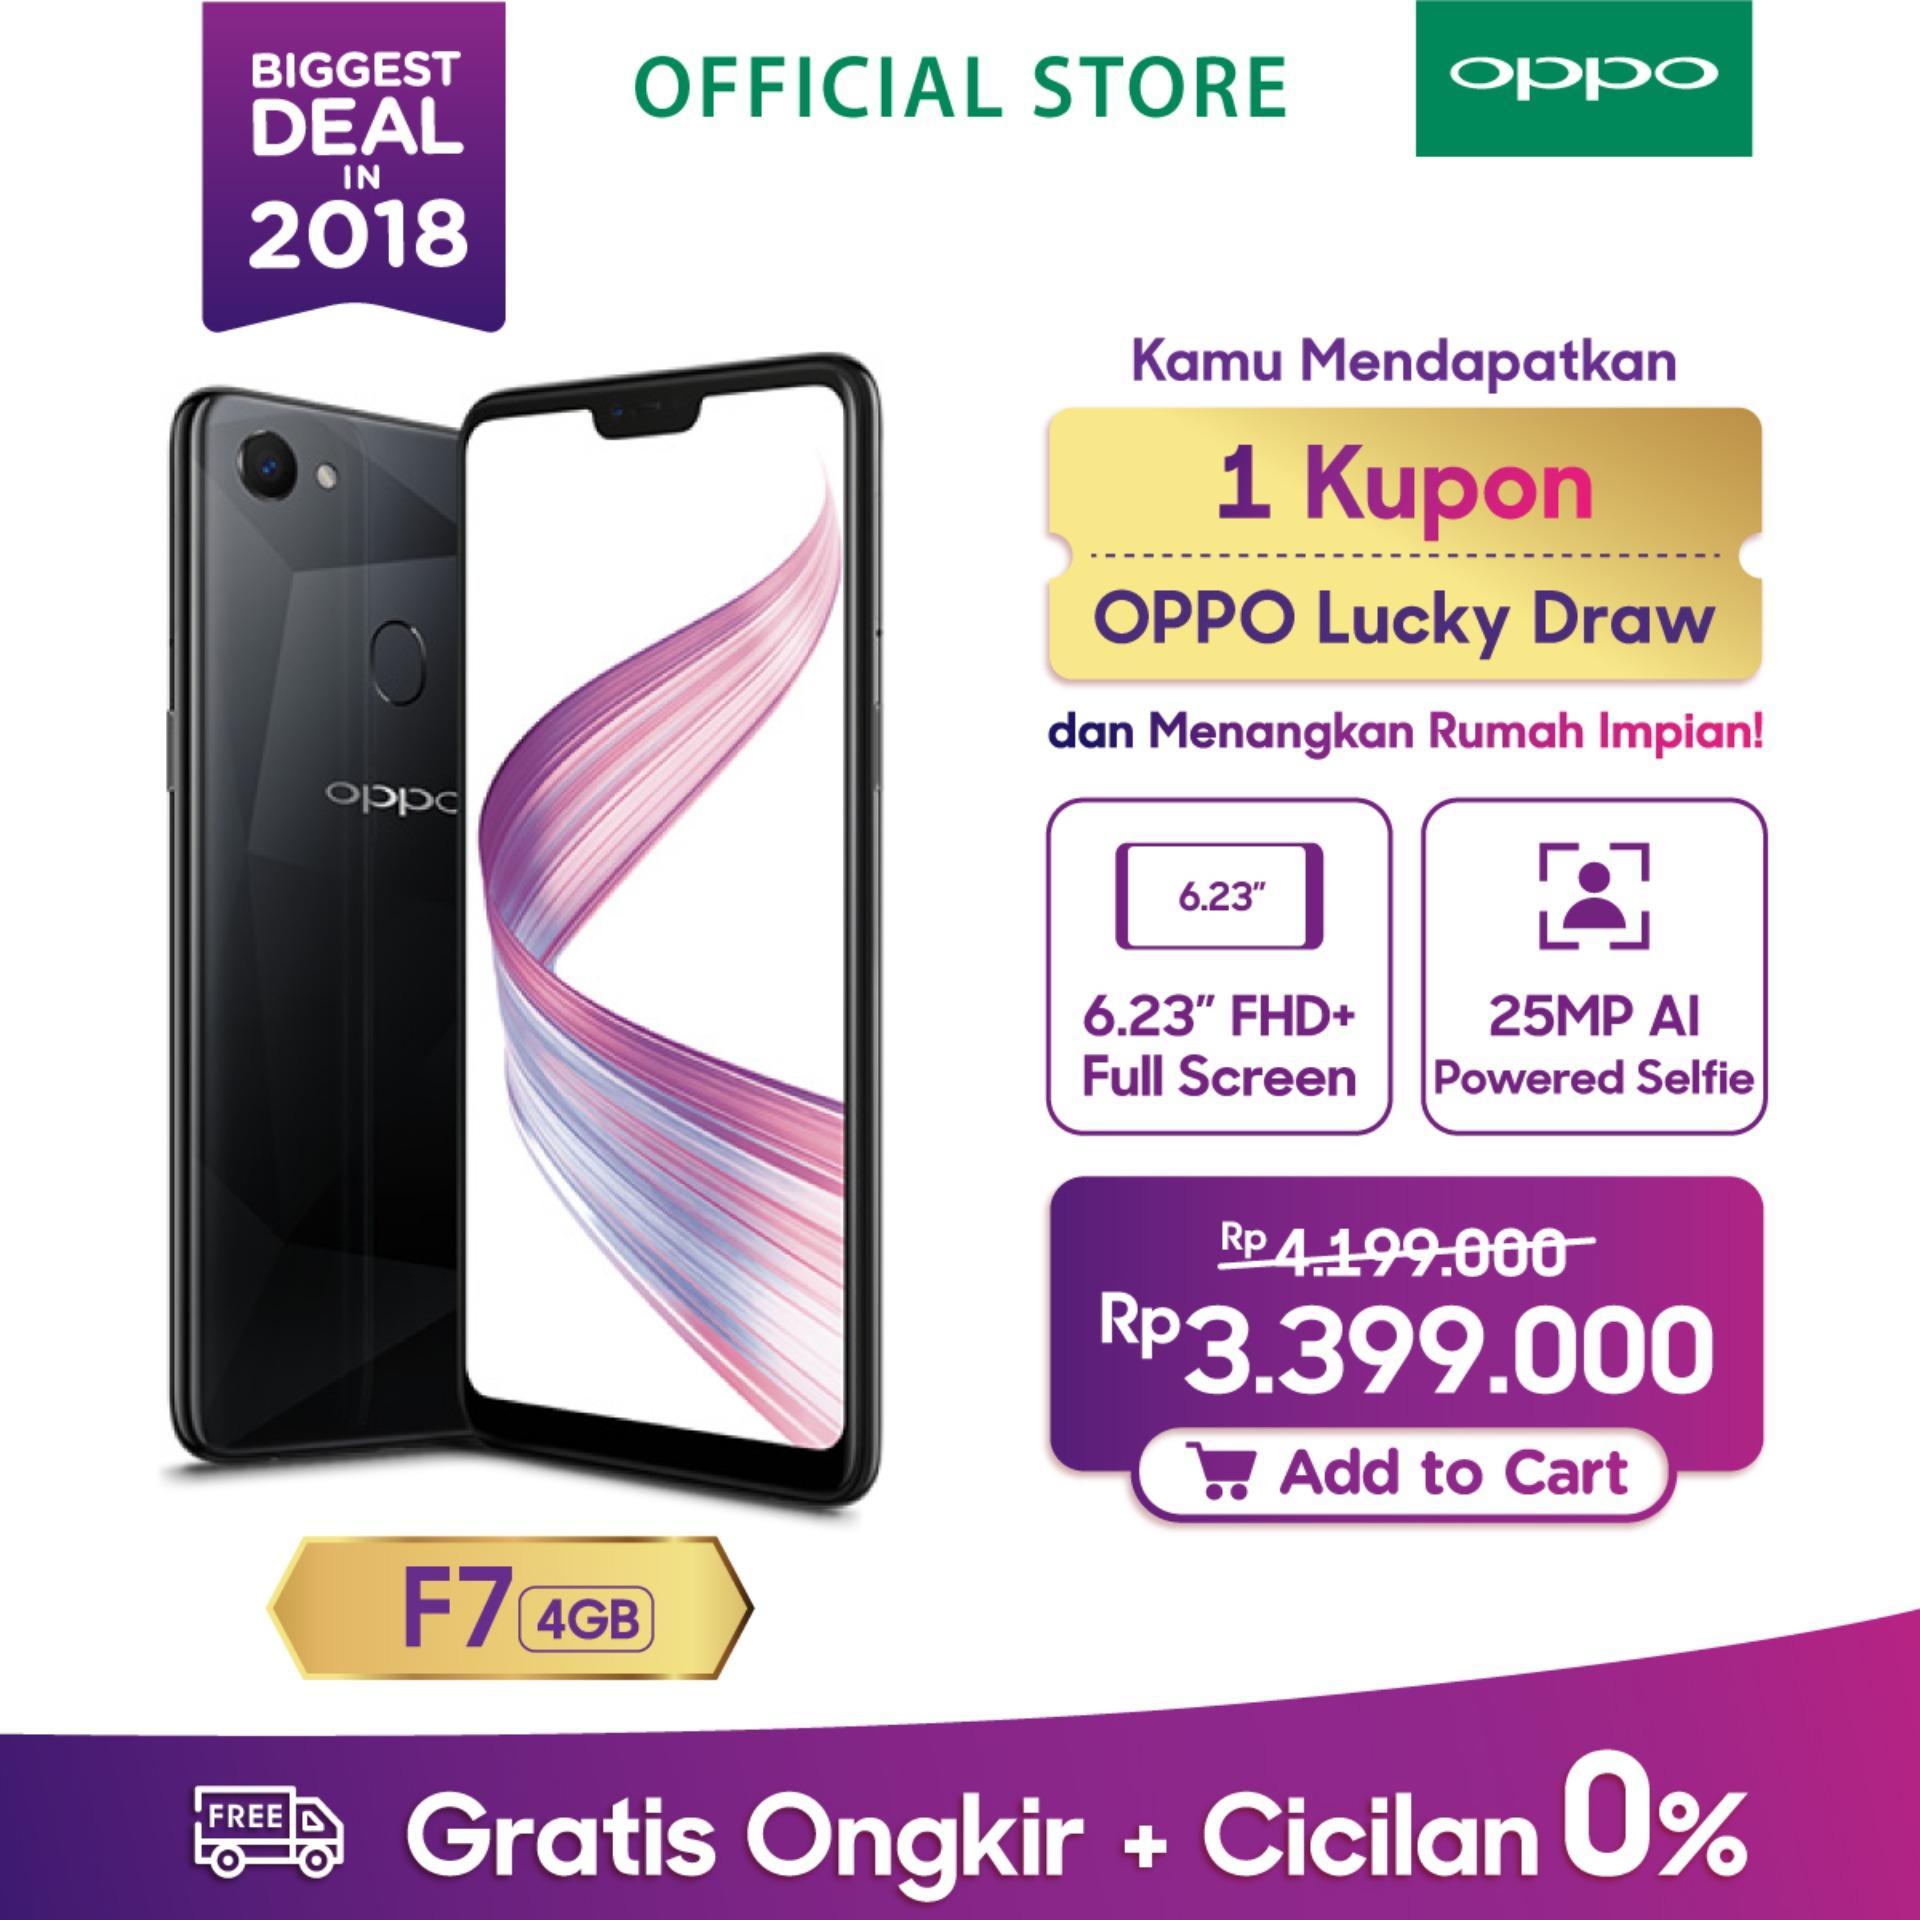 OPPO F7 SMARTPHONE 4GB/64GB Black , Face Unlock, Al-Powered Selfie 25 MP (COD, Garansi Resmi OPPO, Cicilan tanpa kartu kredit, Cicilan 0%, Gratis Ongkir)